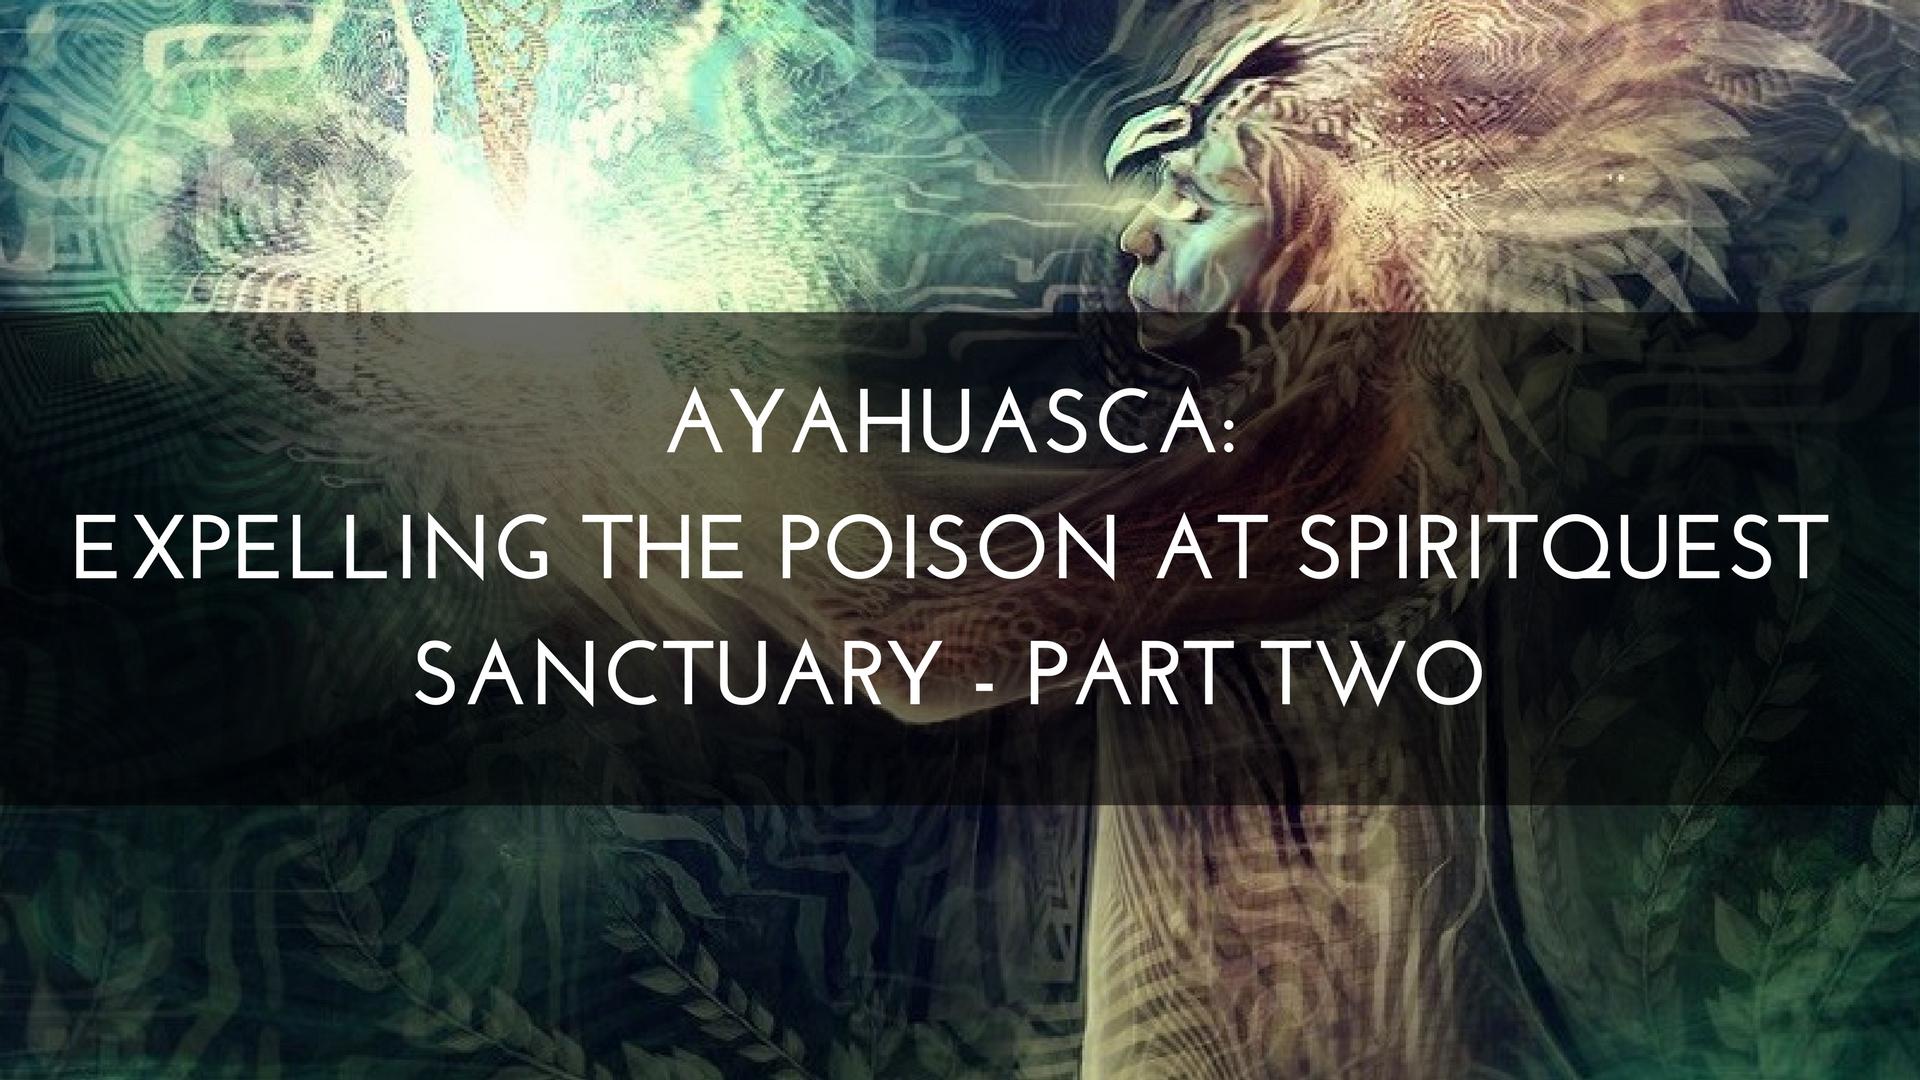 Ayahuasca: Expelling The Poison at SpiritQuest Sanctuary